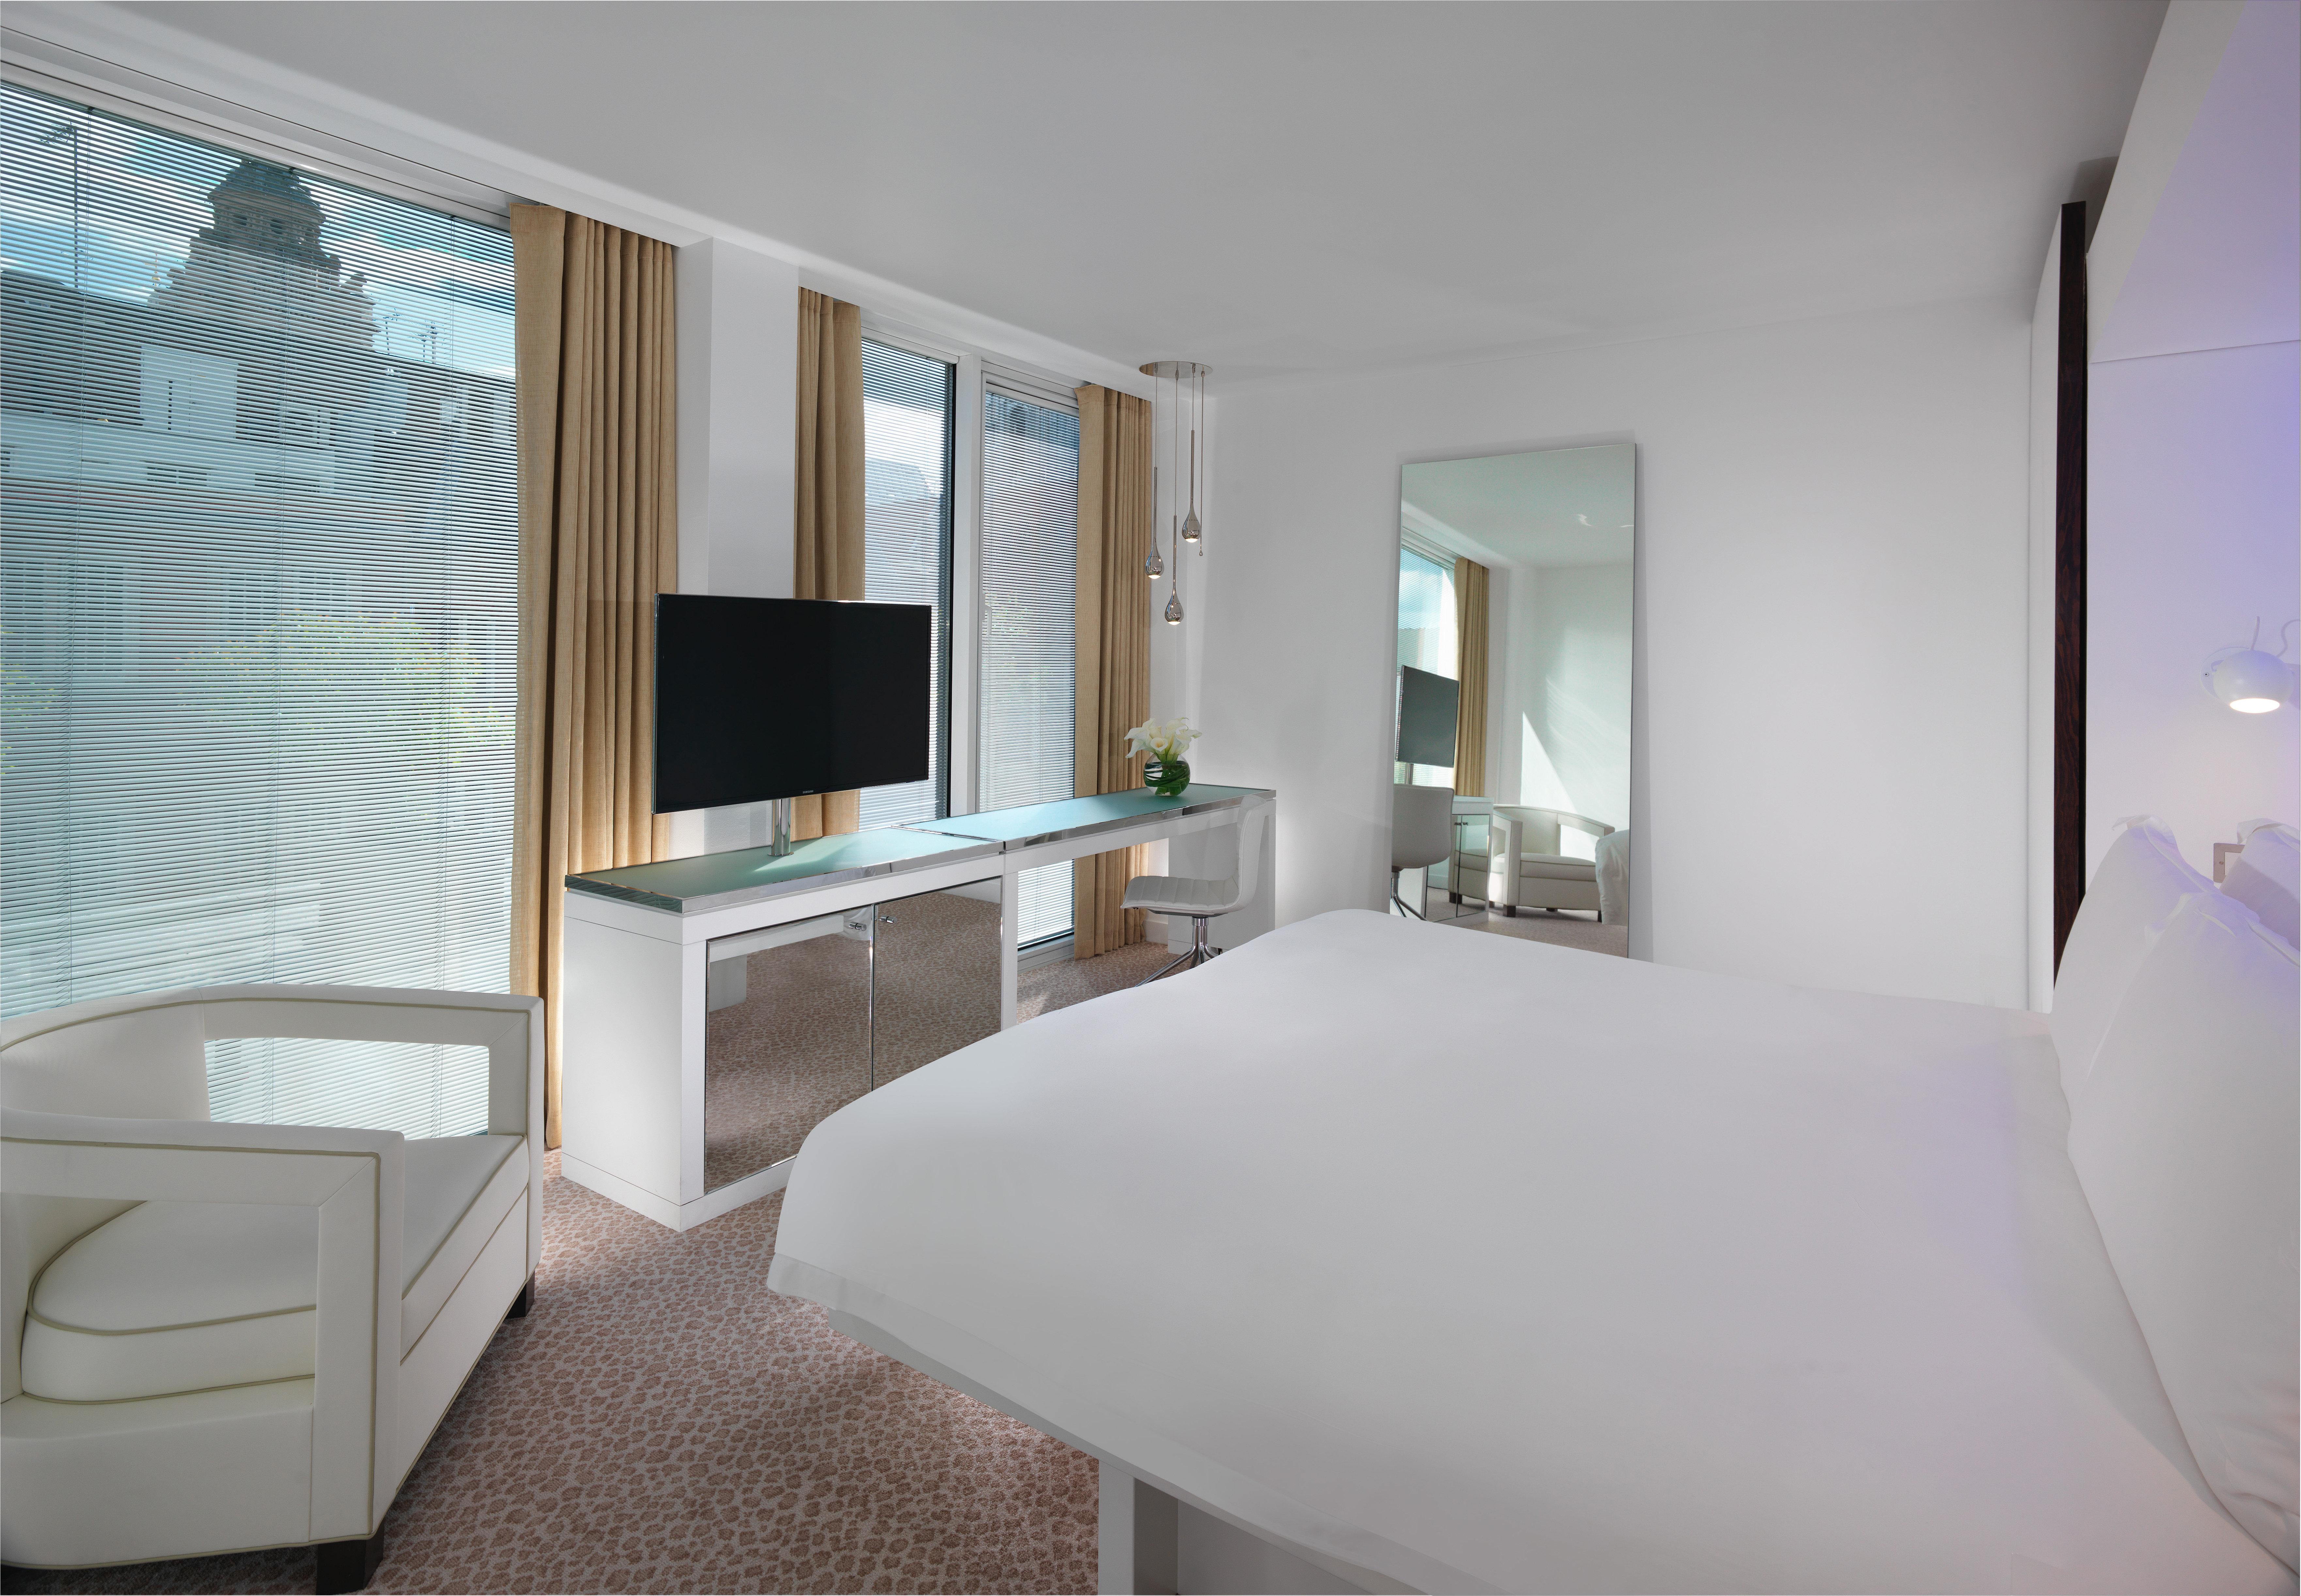 Architecture Bedroom Boutique Modern Scenic views property Suite condominium living room Villa cottage